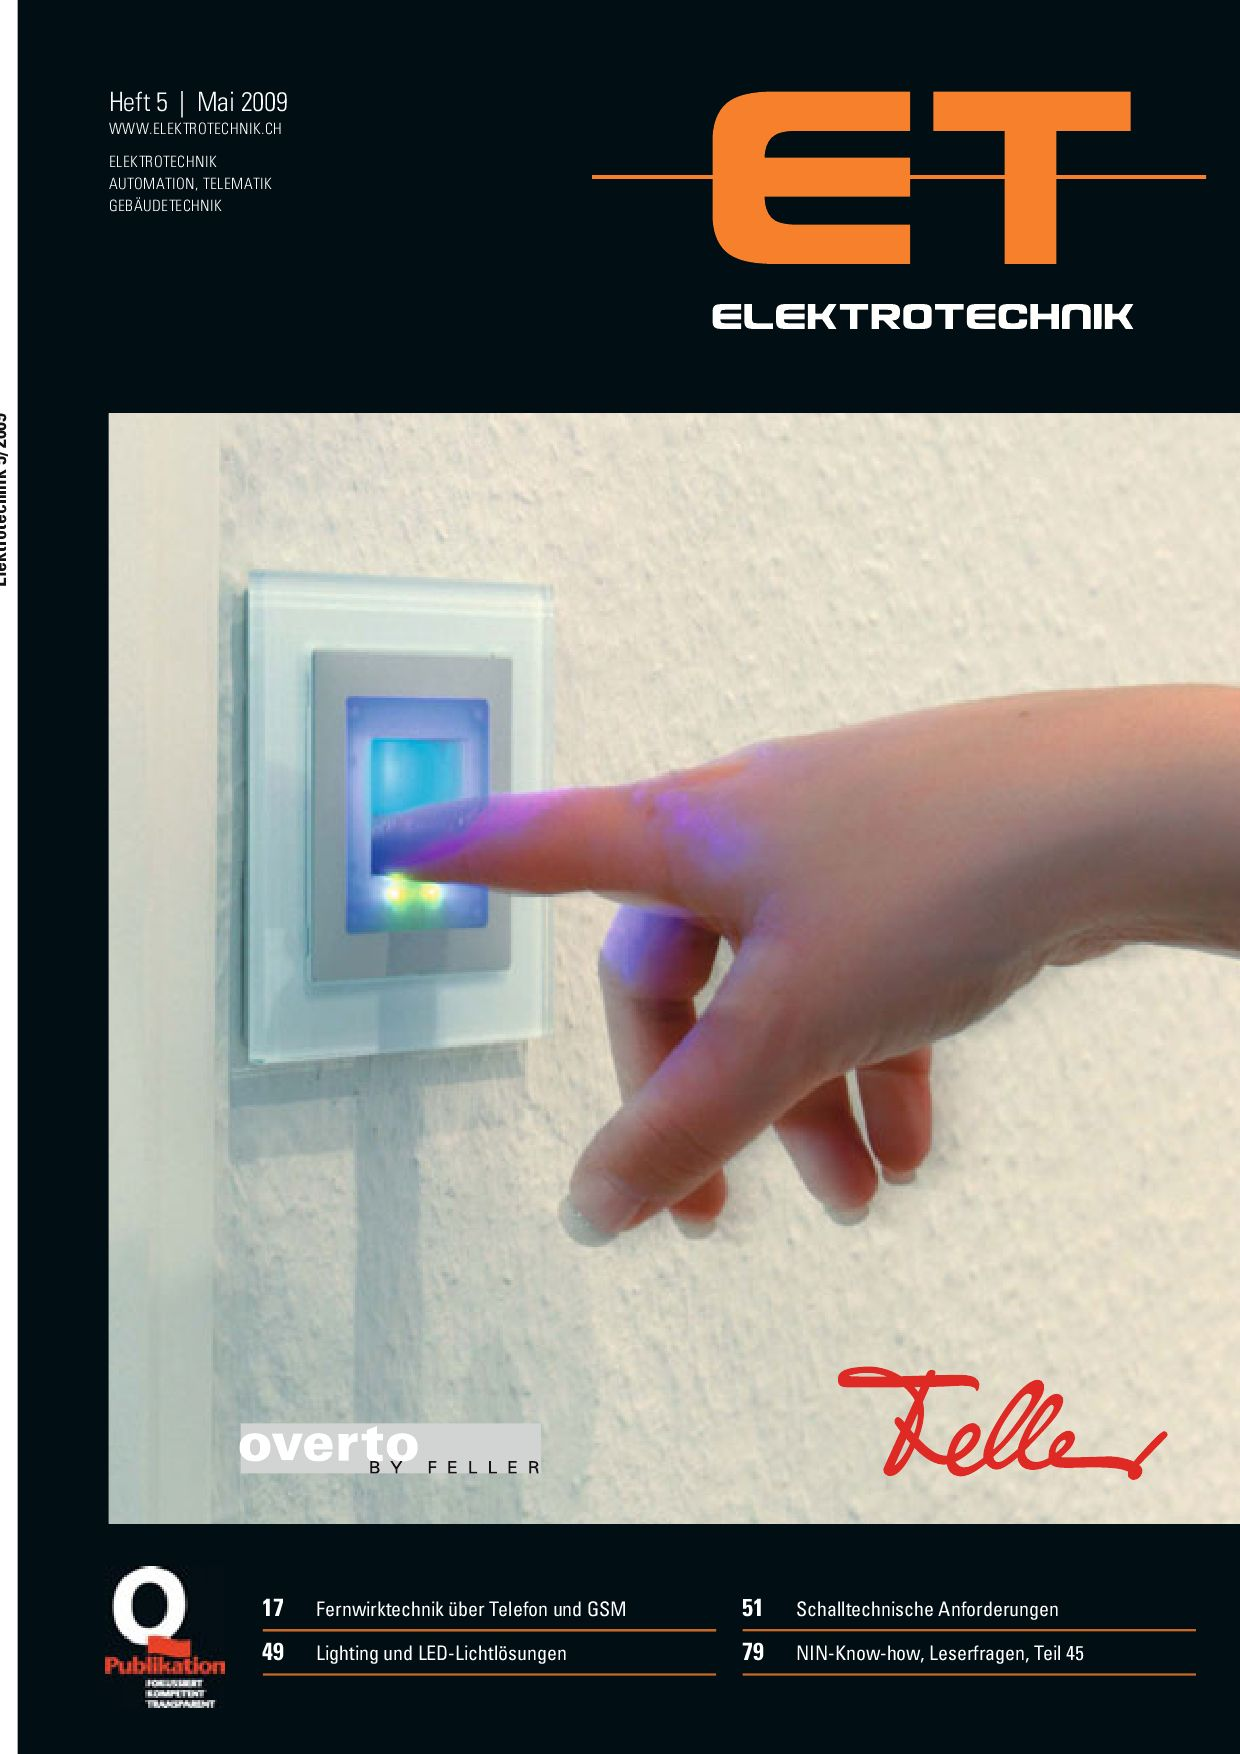 Elektrotechnik 2009/05 by Daniel Gugger - issuu